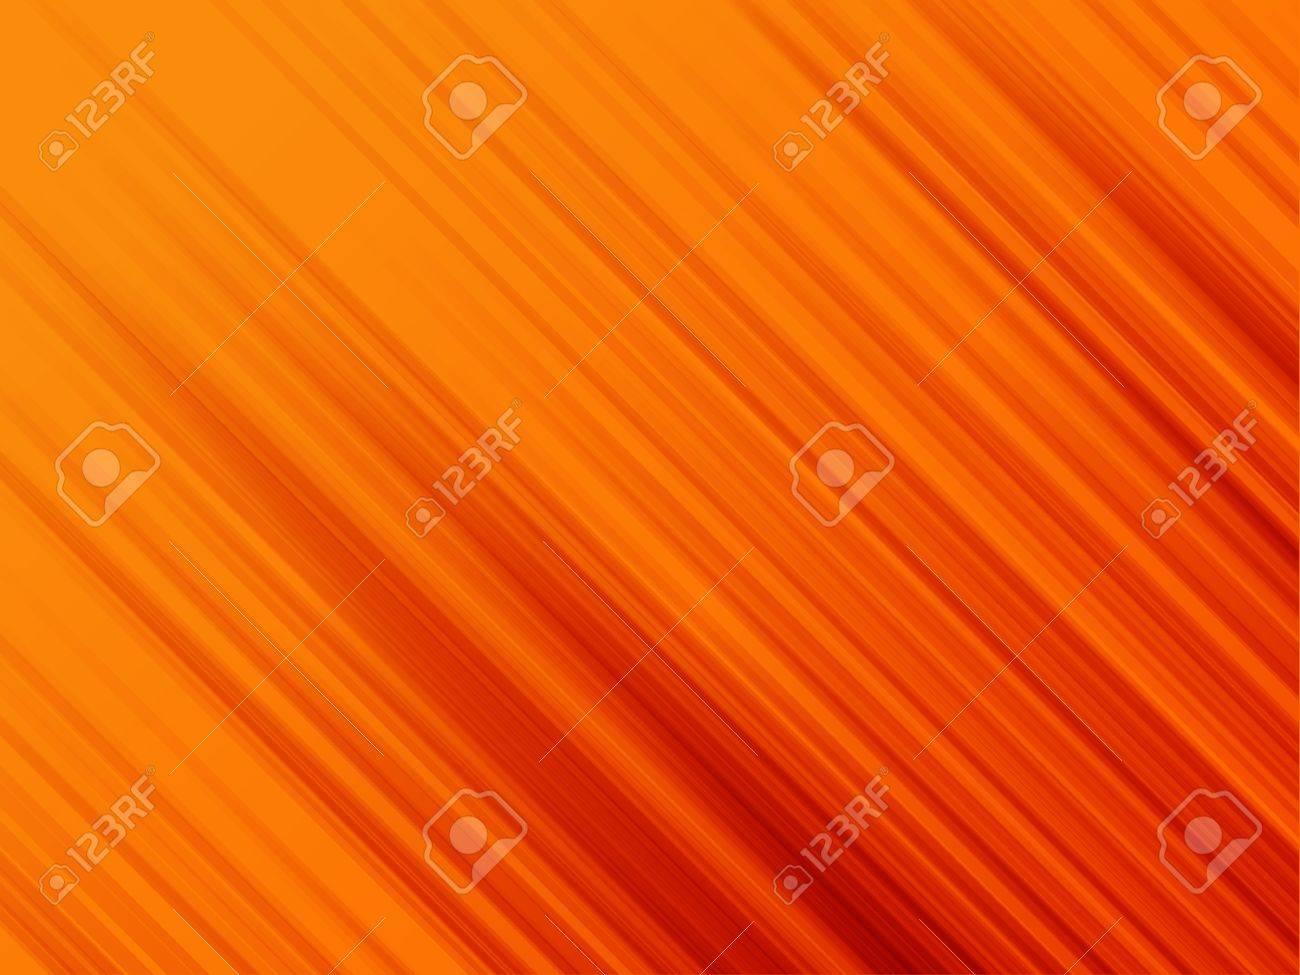 Illustration of gradient lines shooting diagonally over orange background. - 9757252